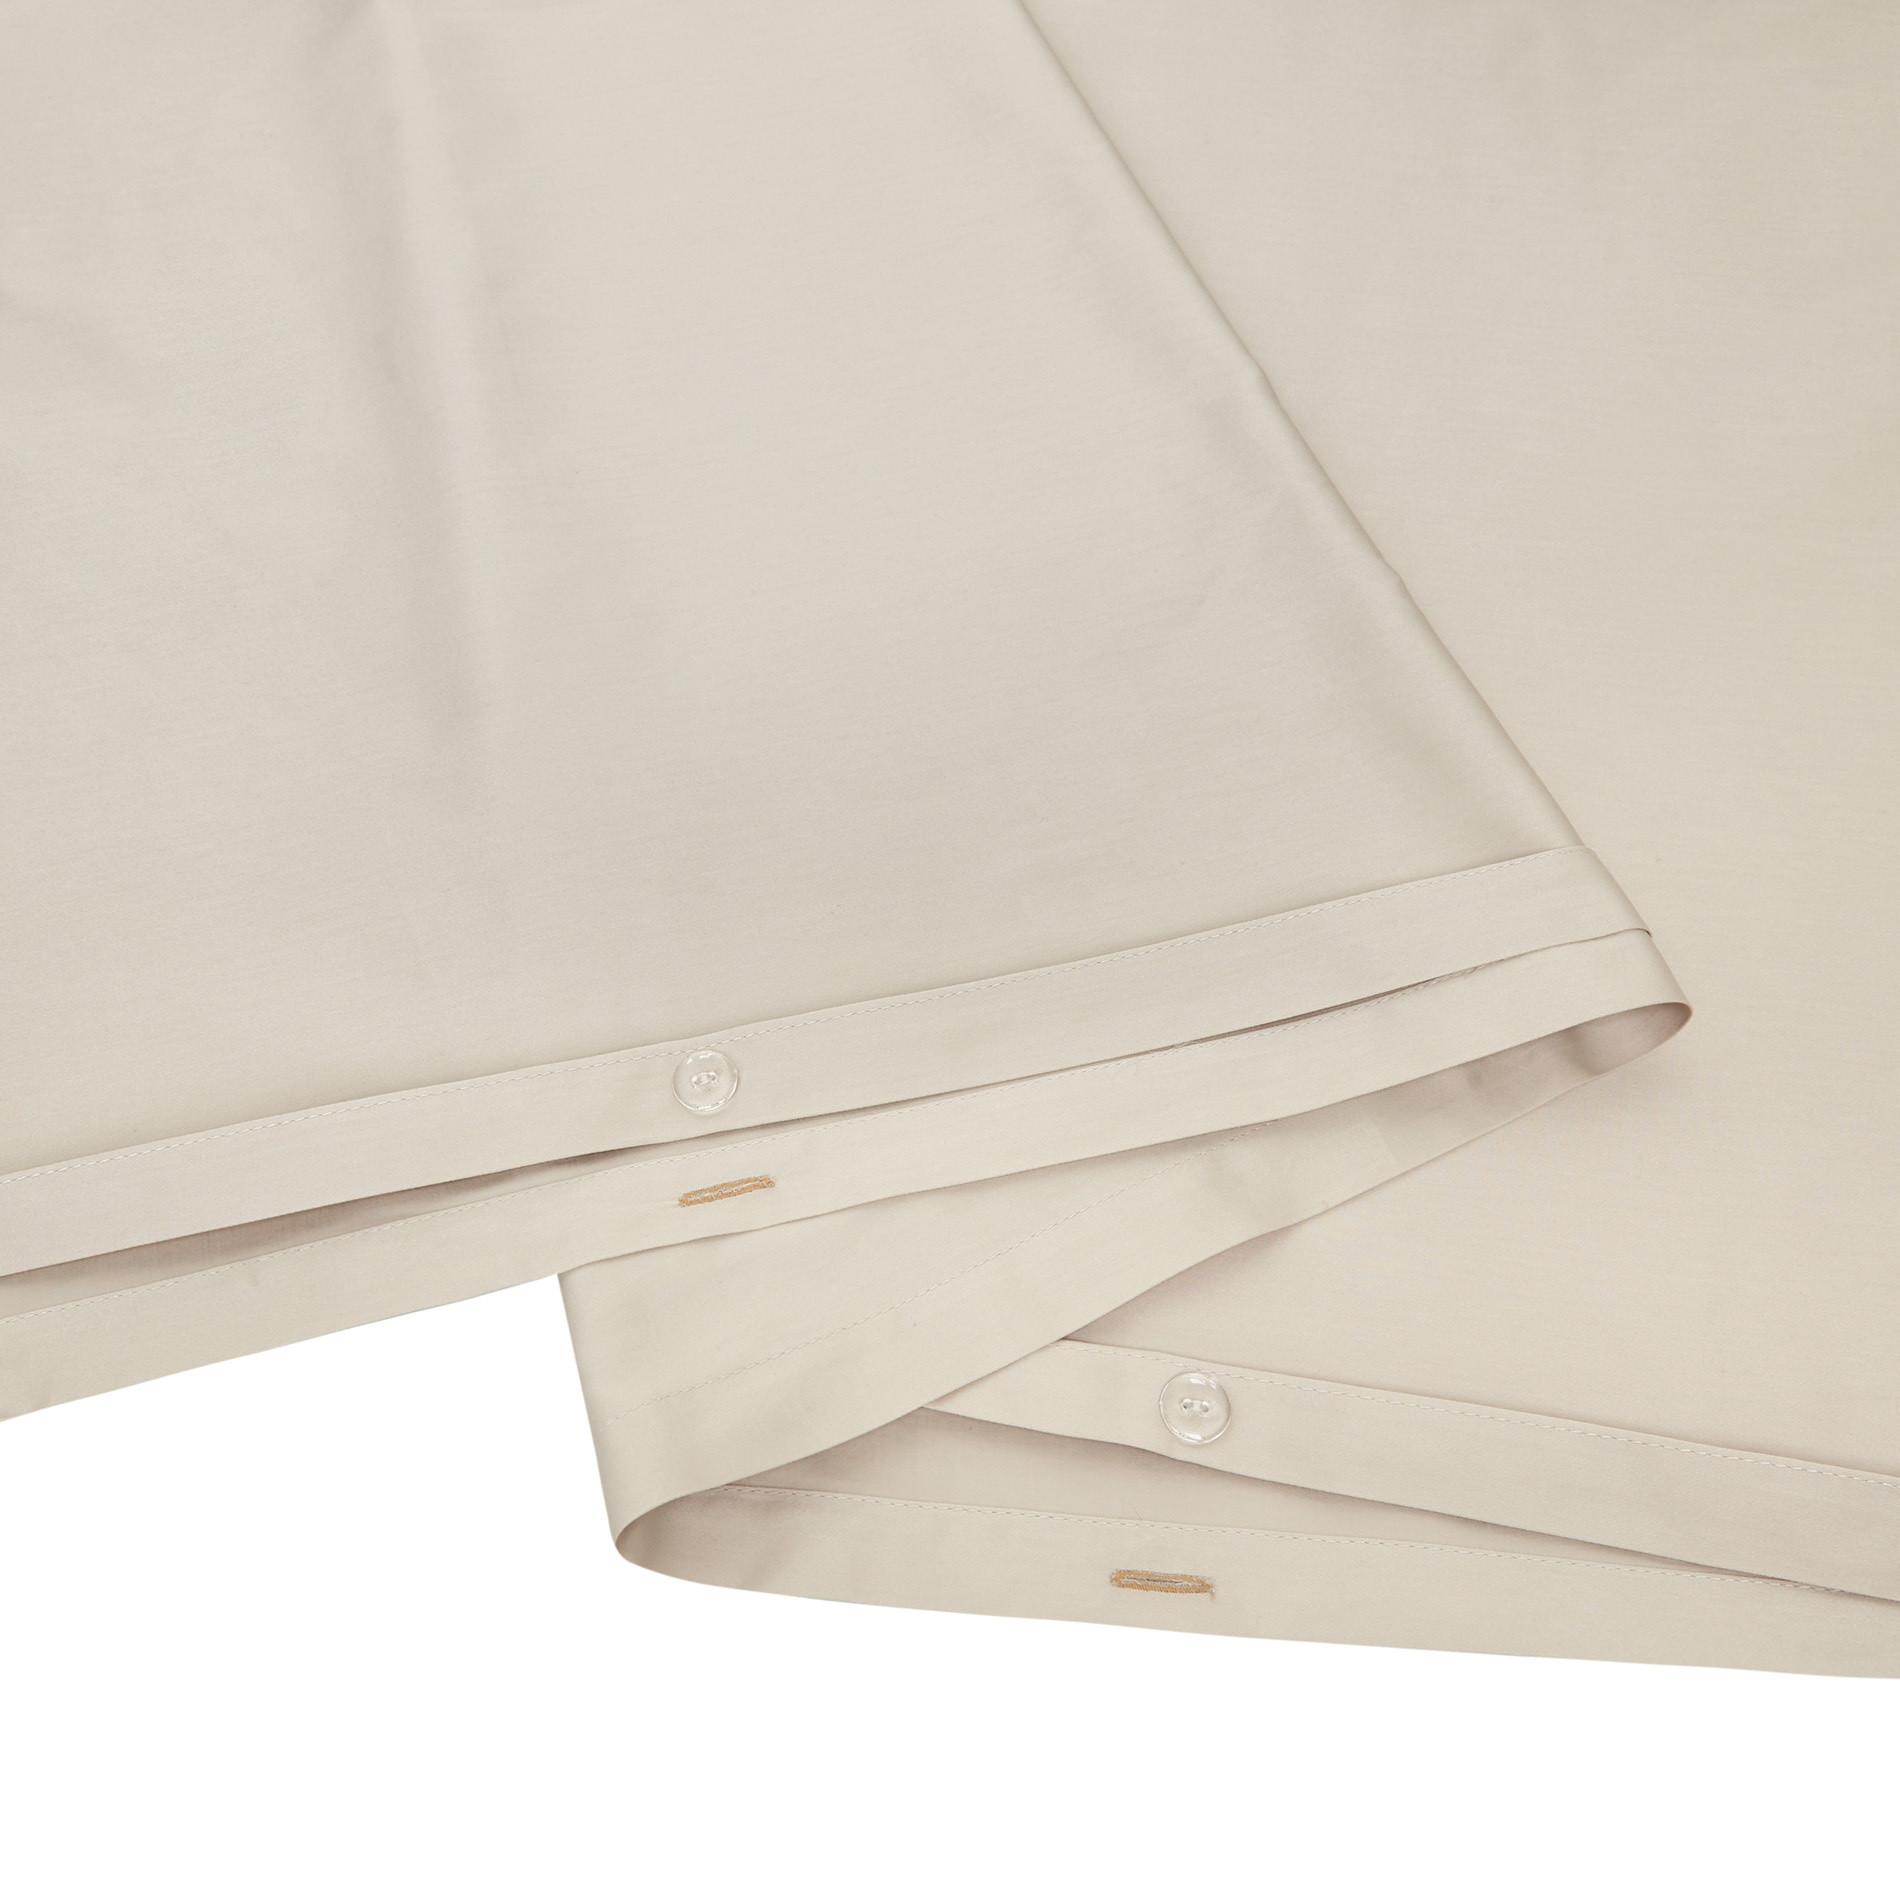 Parure copripiumino raso di puro cotone Zefiro, Beige, large image number 2